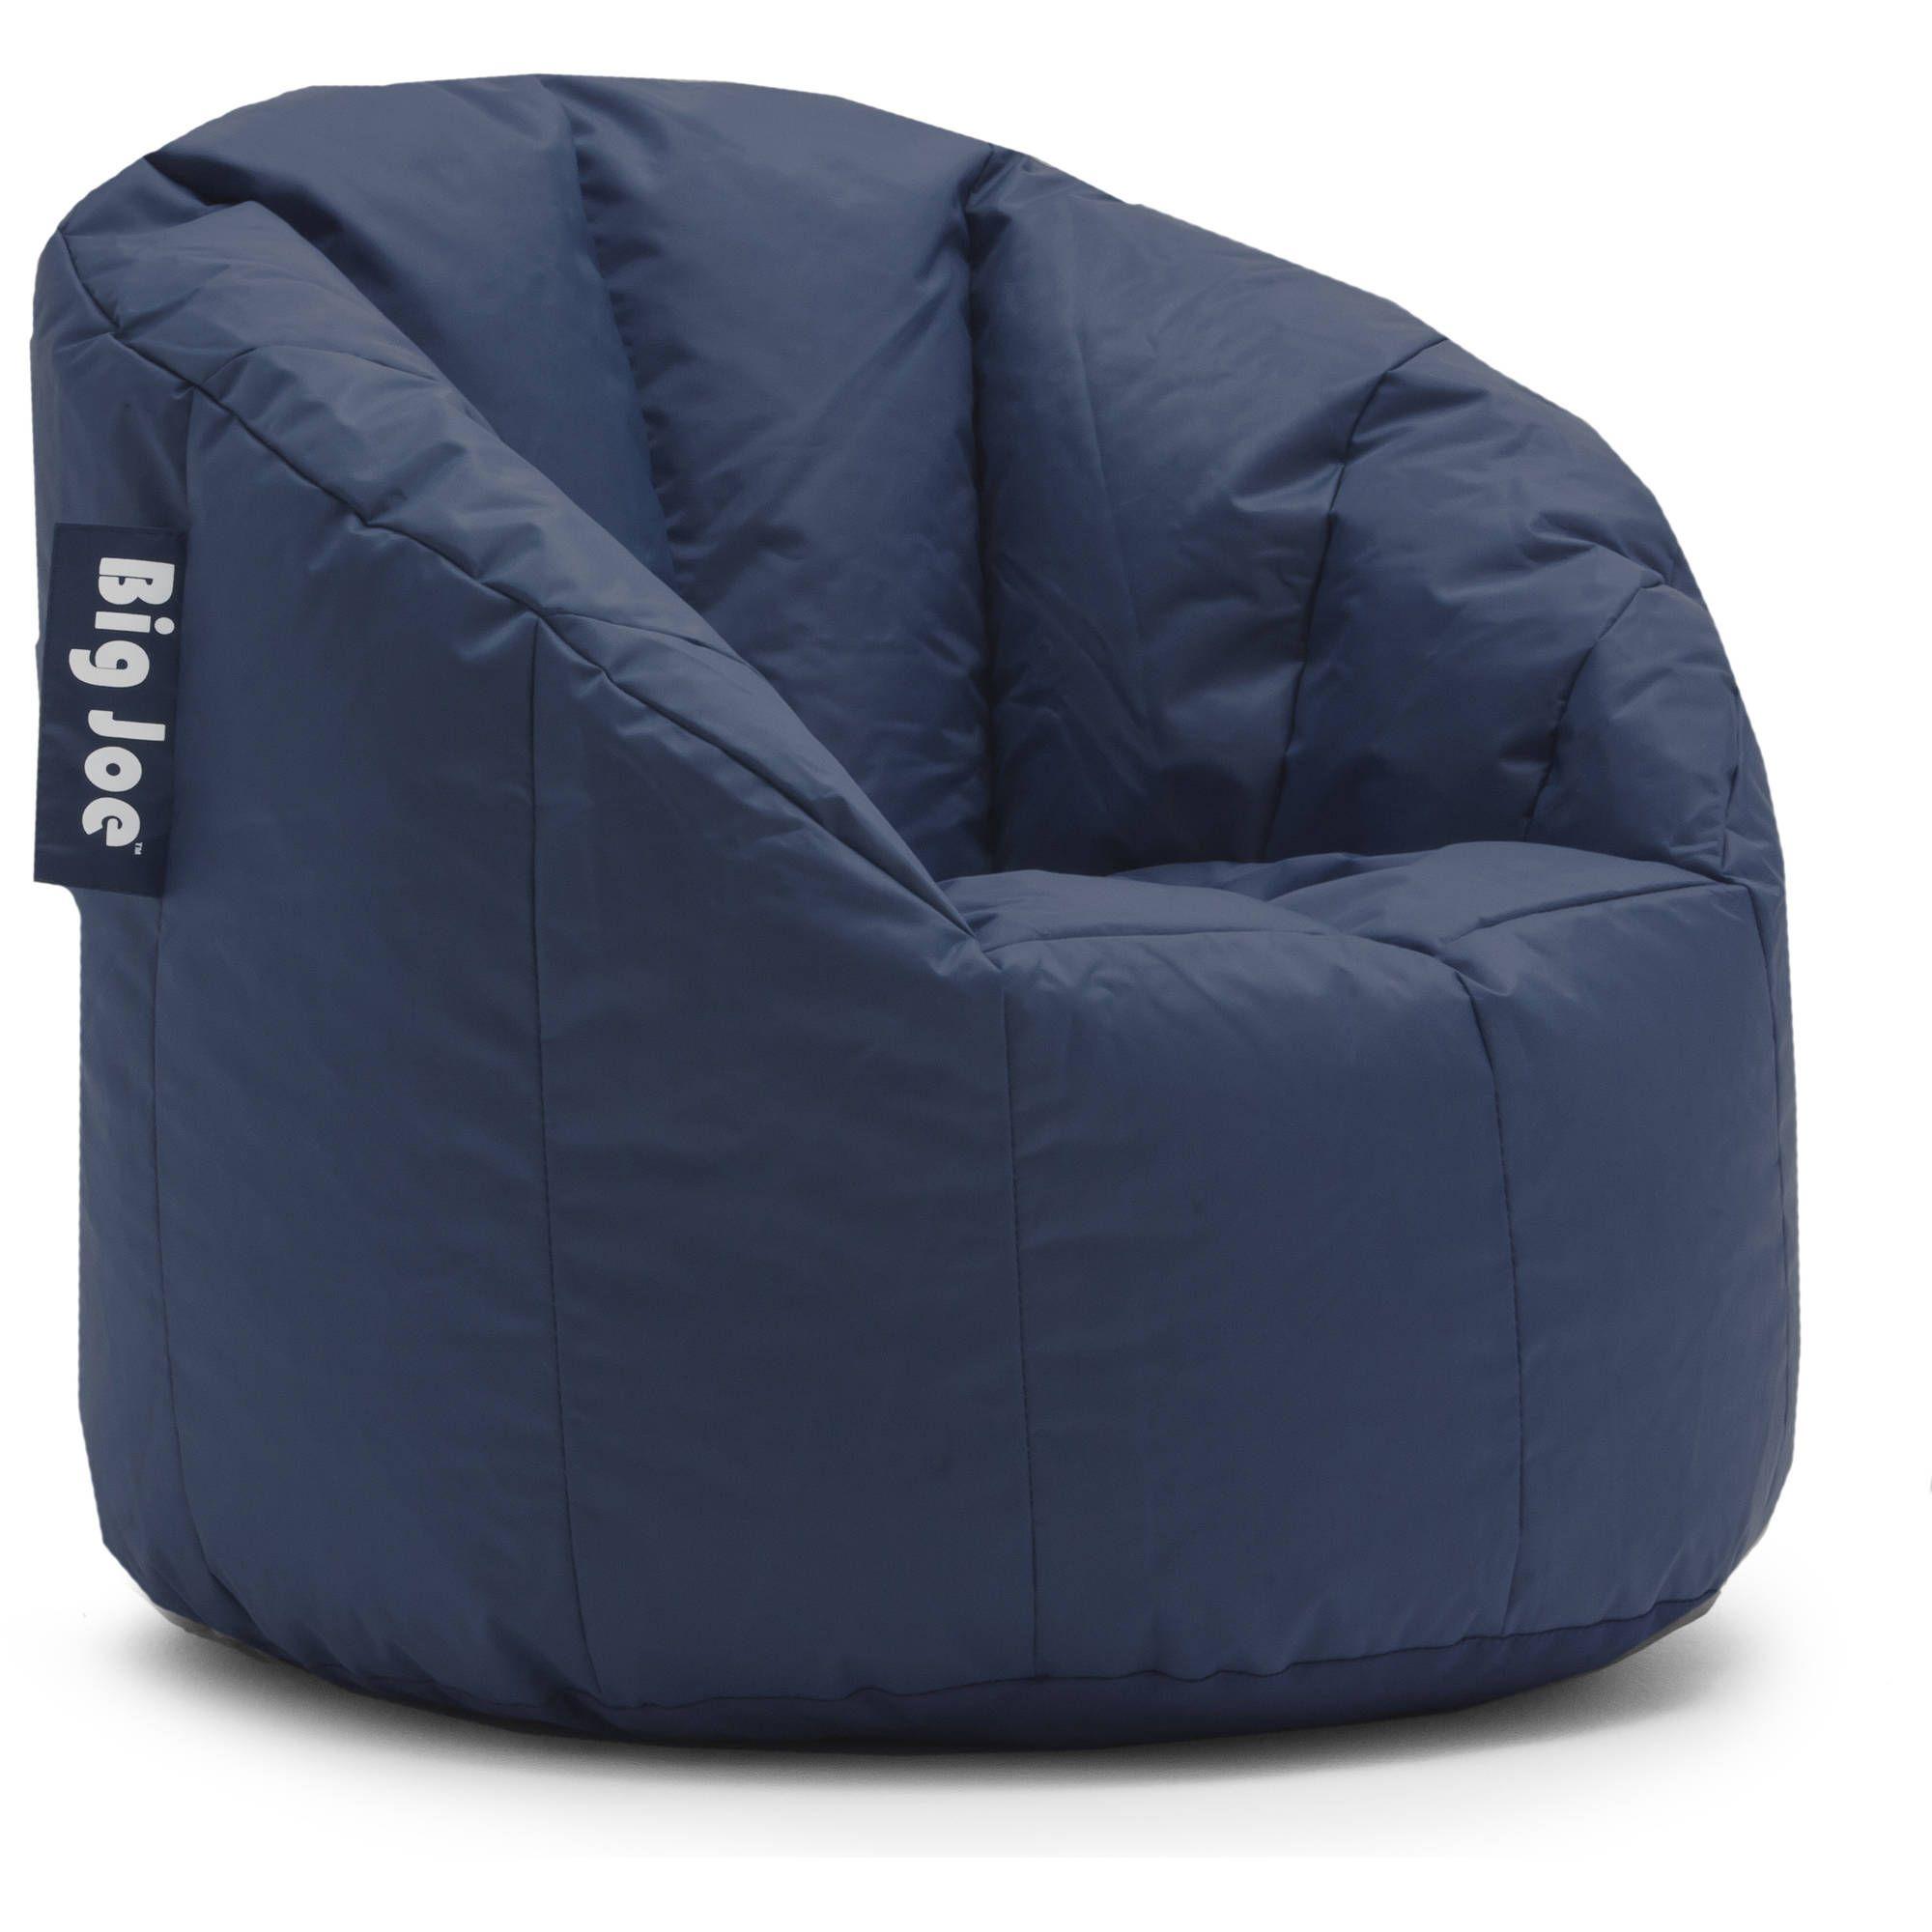 Swell Bean Bag Chairs For Adults Bean Bag Chair Bean Bag Big Gamerscity Chair Design For Home Gamerscityorg